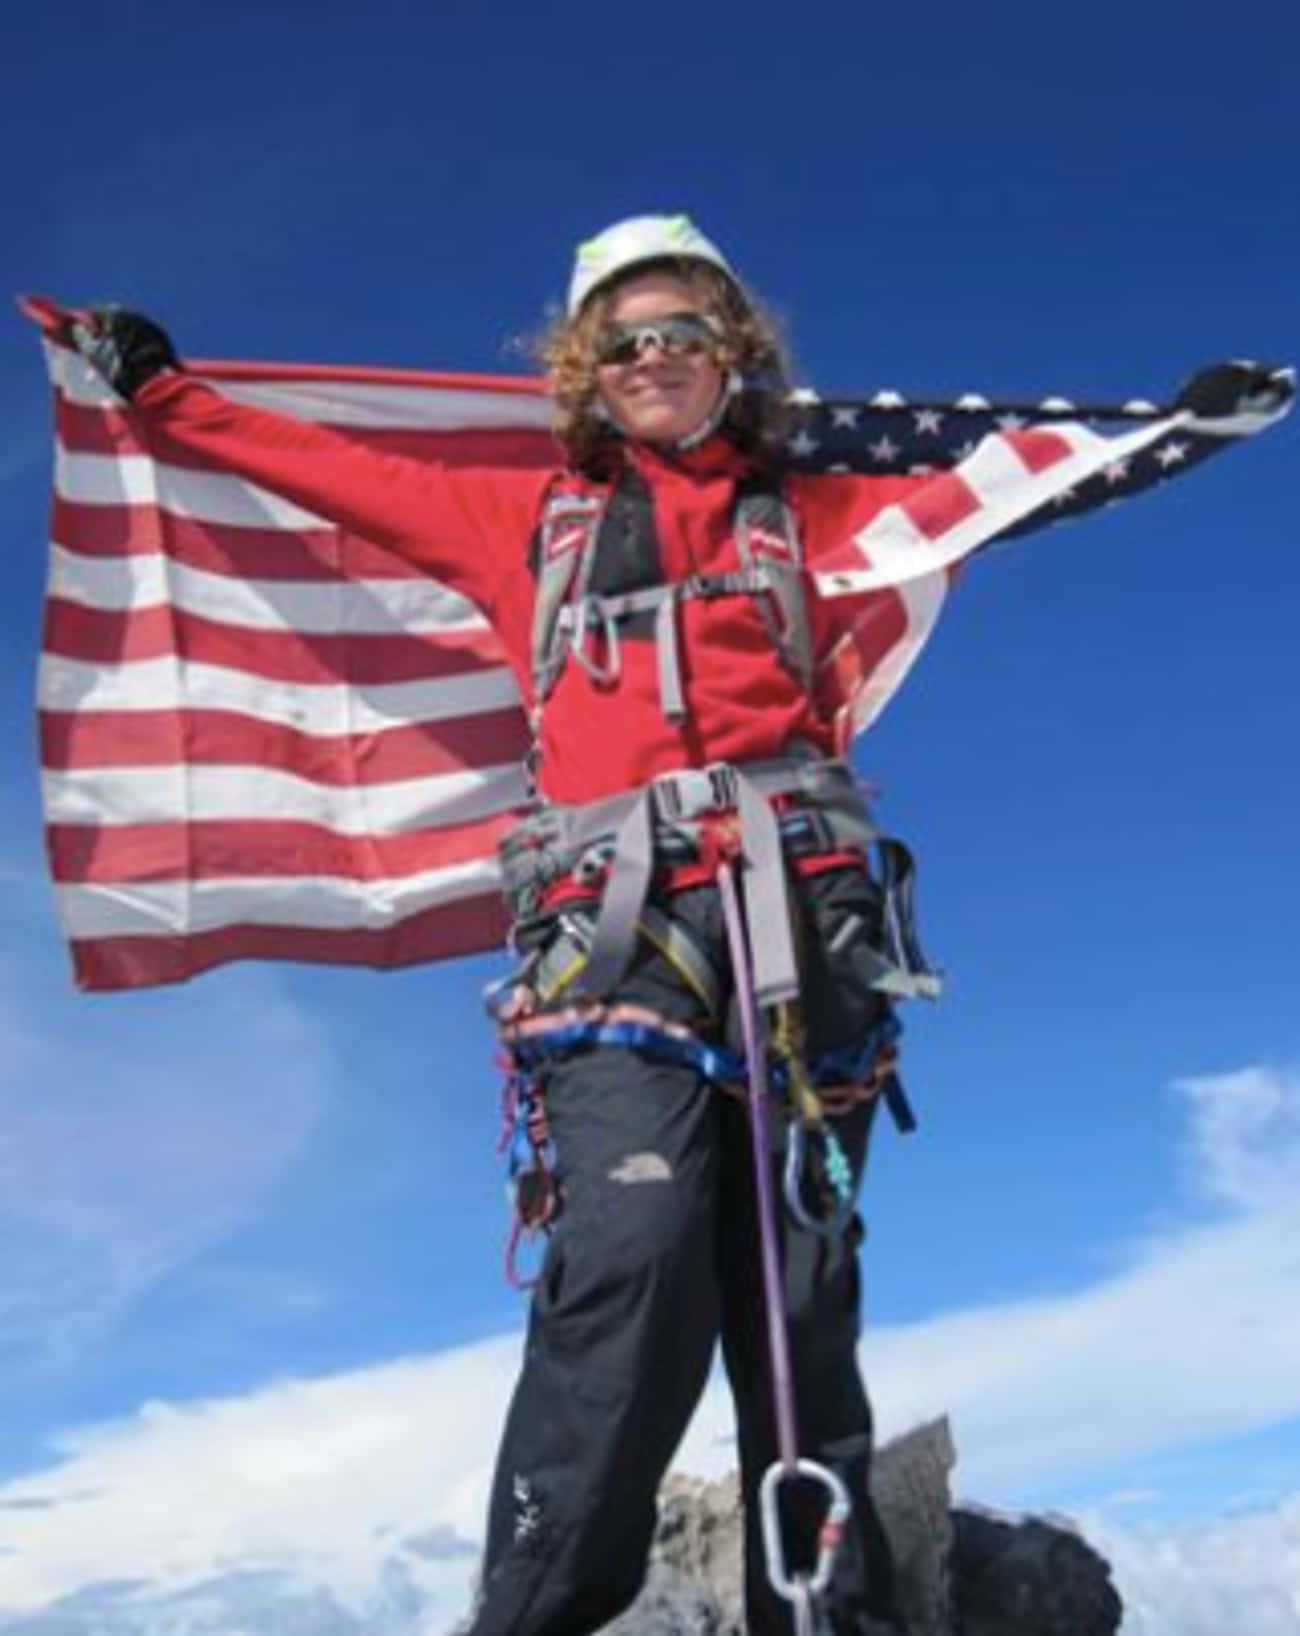 Jordan Romero Climbed Mt. Everest at Age 13